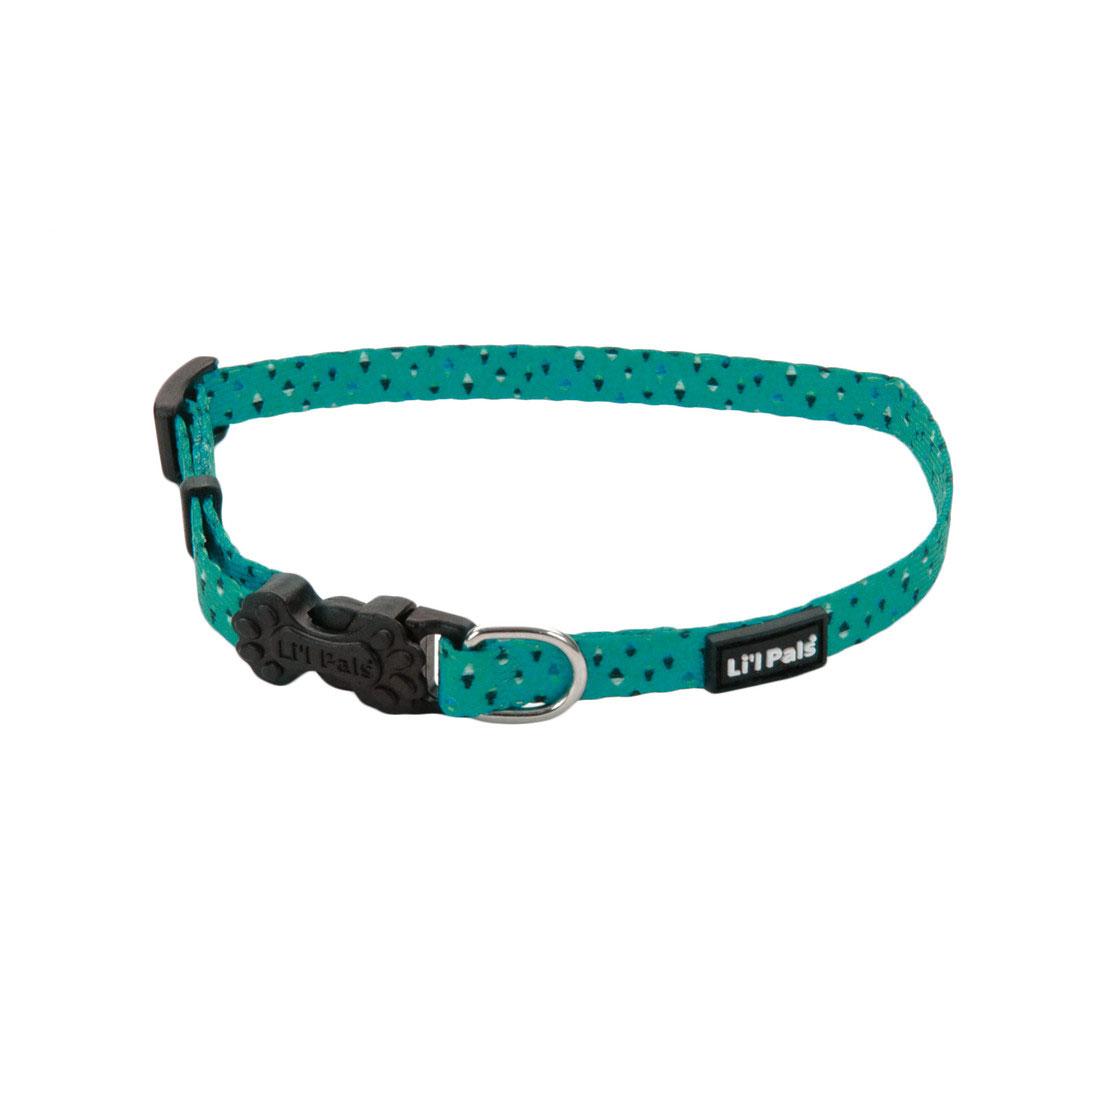 Coastal Pet Products 06221 TGD07